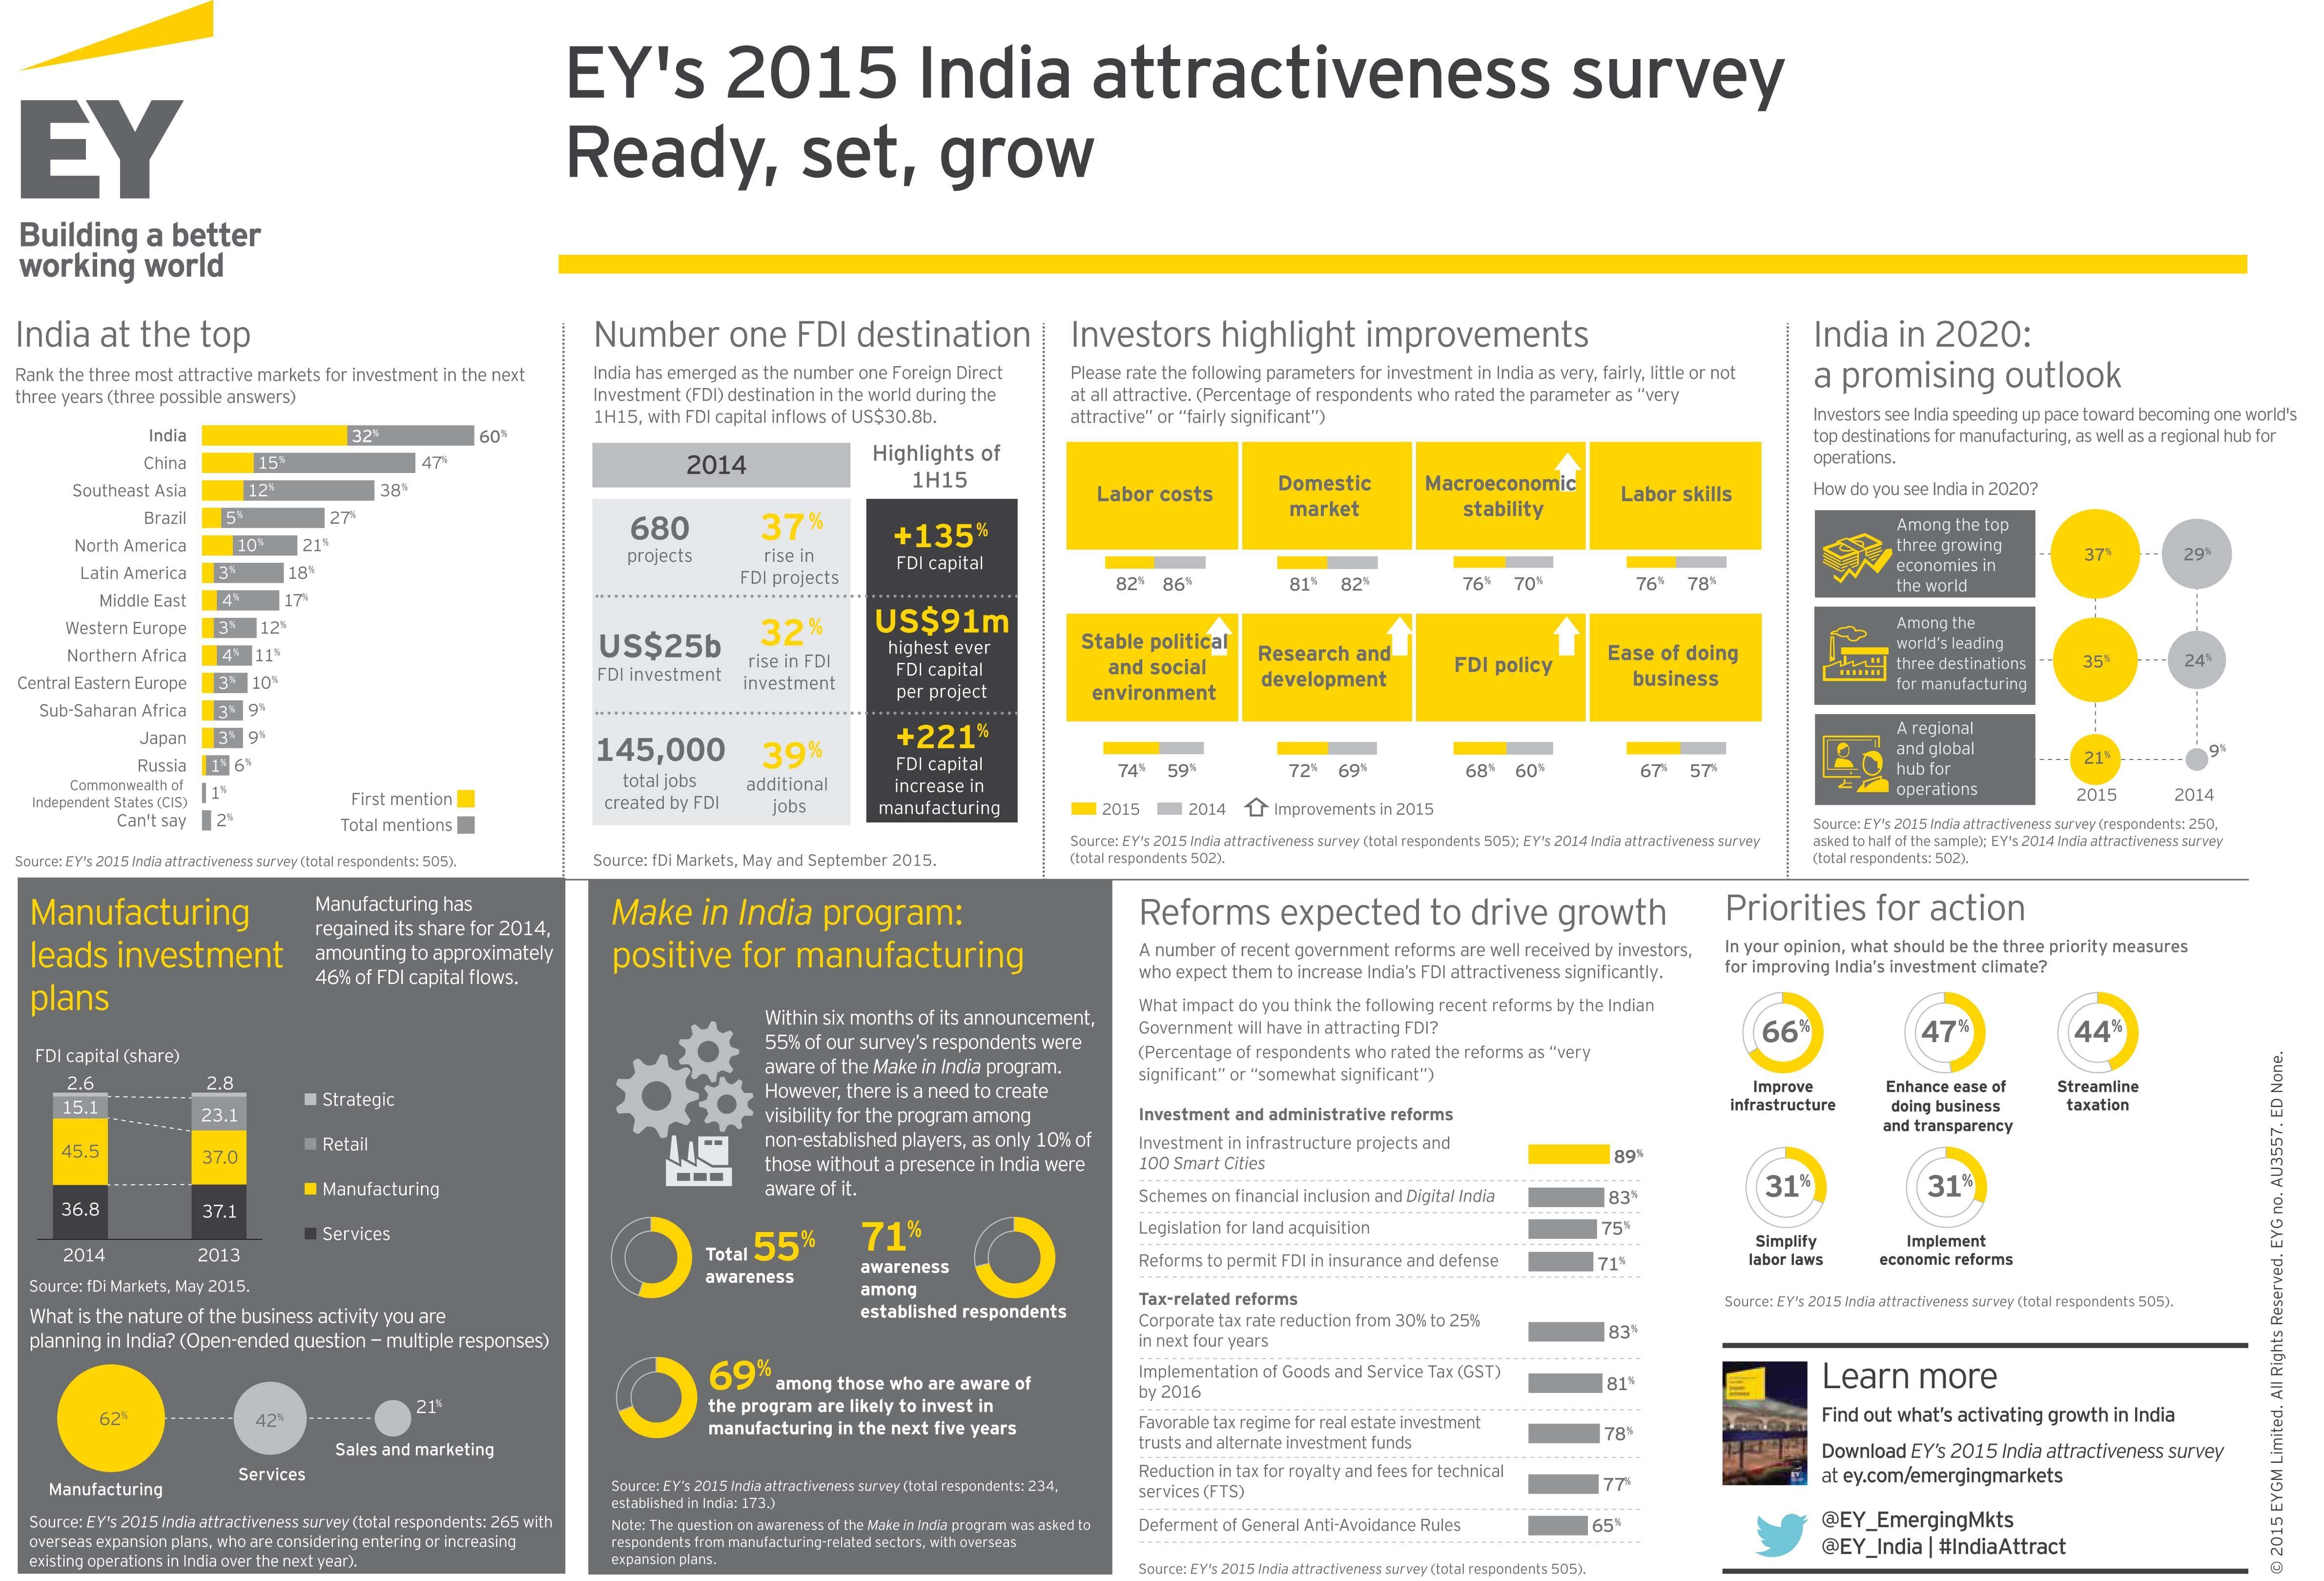 EY's India Attractiveness Survey 2015. Investors see